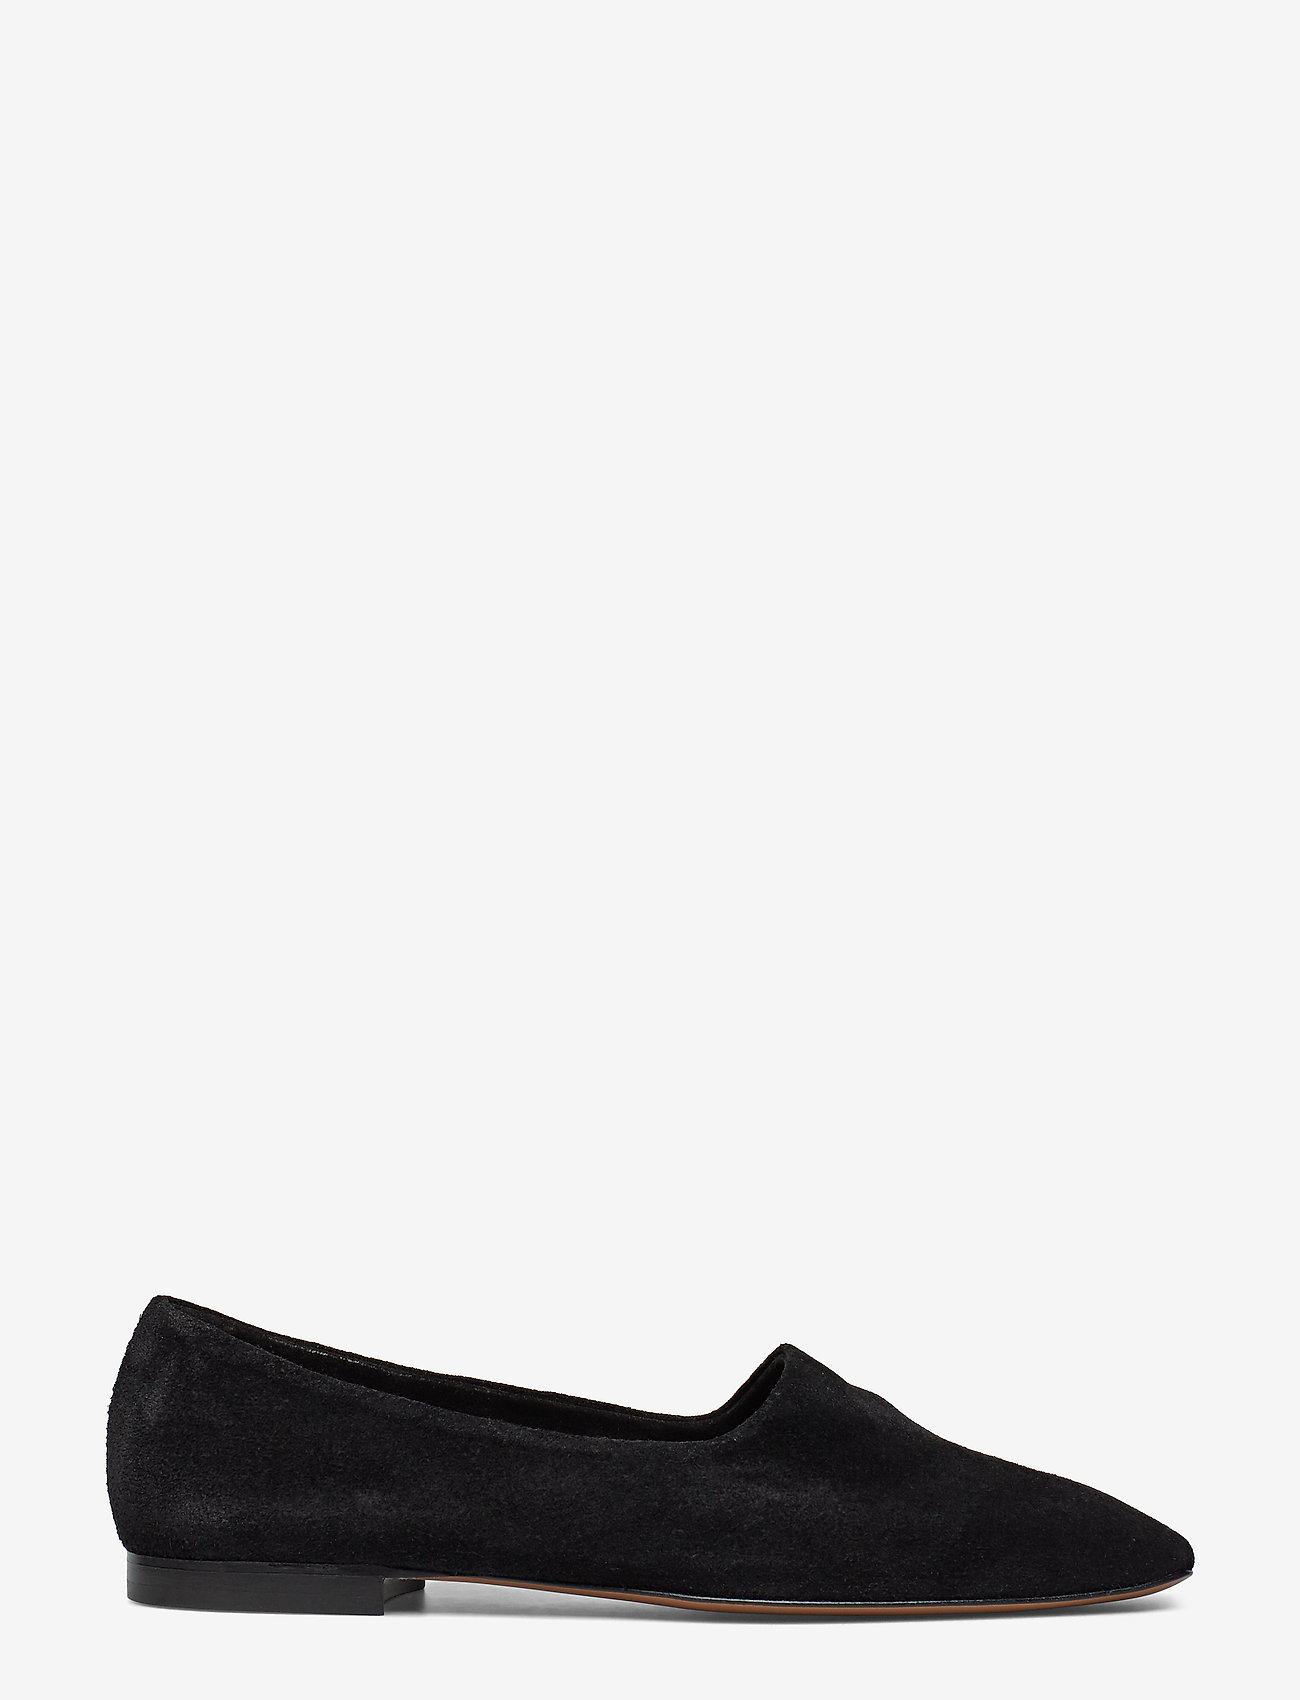 ATP Atelier - Andrano Black Suede - shoes - black - 1